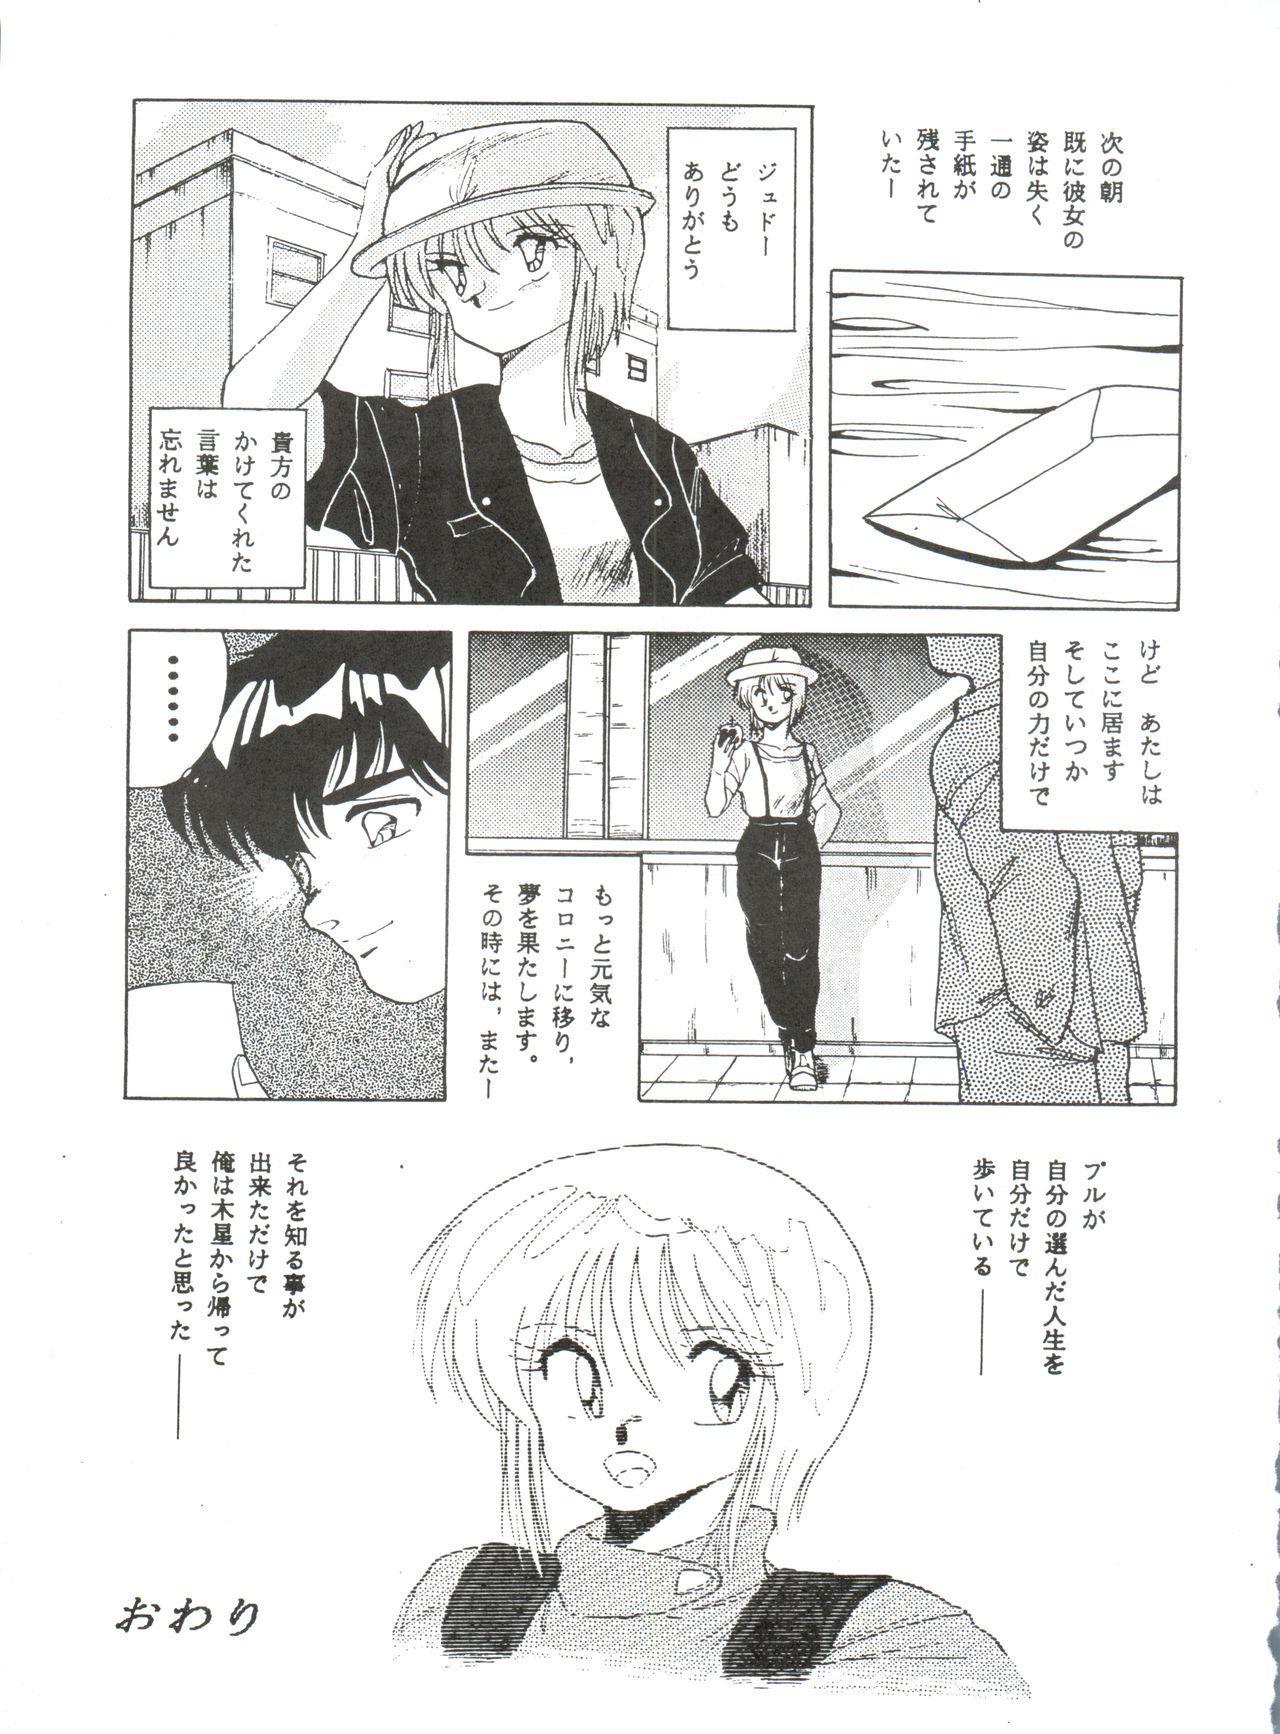 [Studio Fuck (Various) Onapet 7 (Sonic Soldier Borgman, Gundam ZZ, Osomatsu-kun) 14